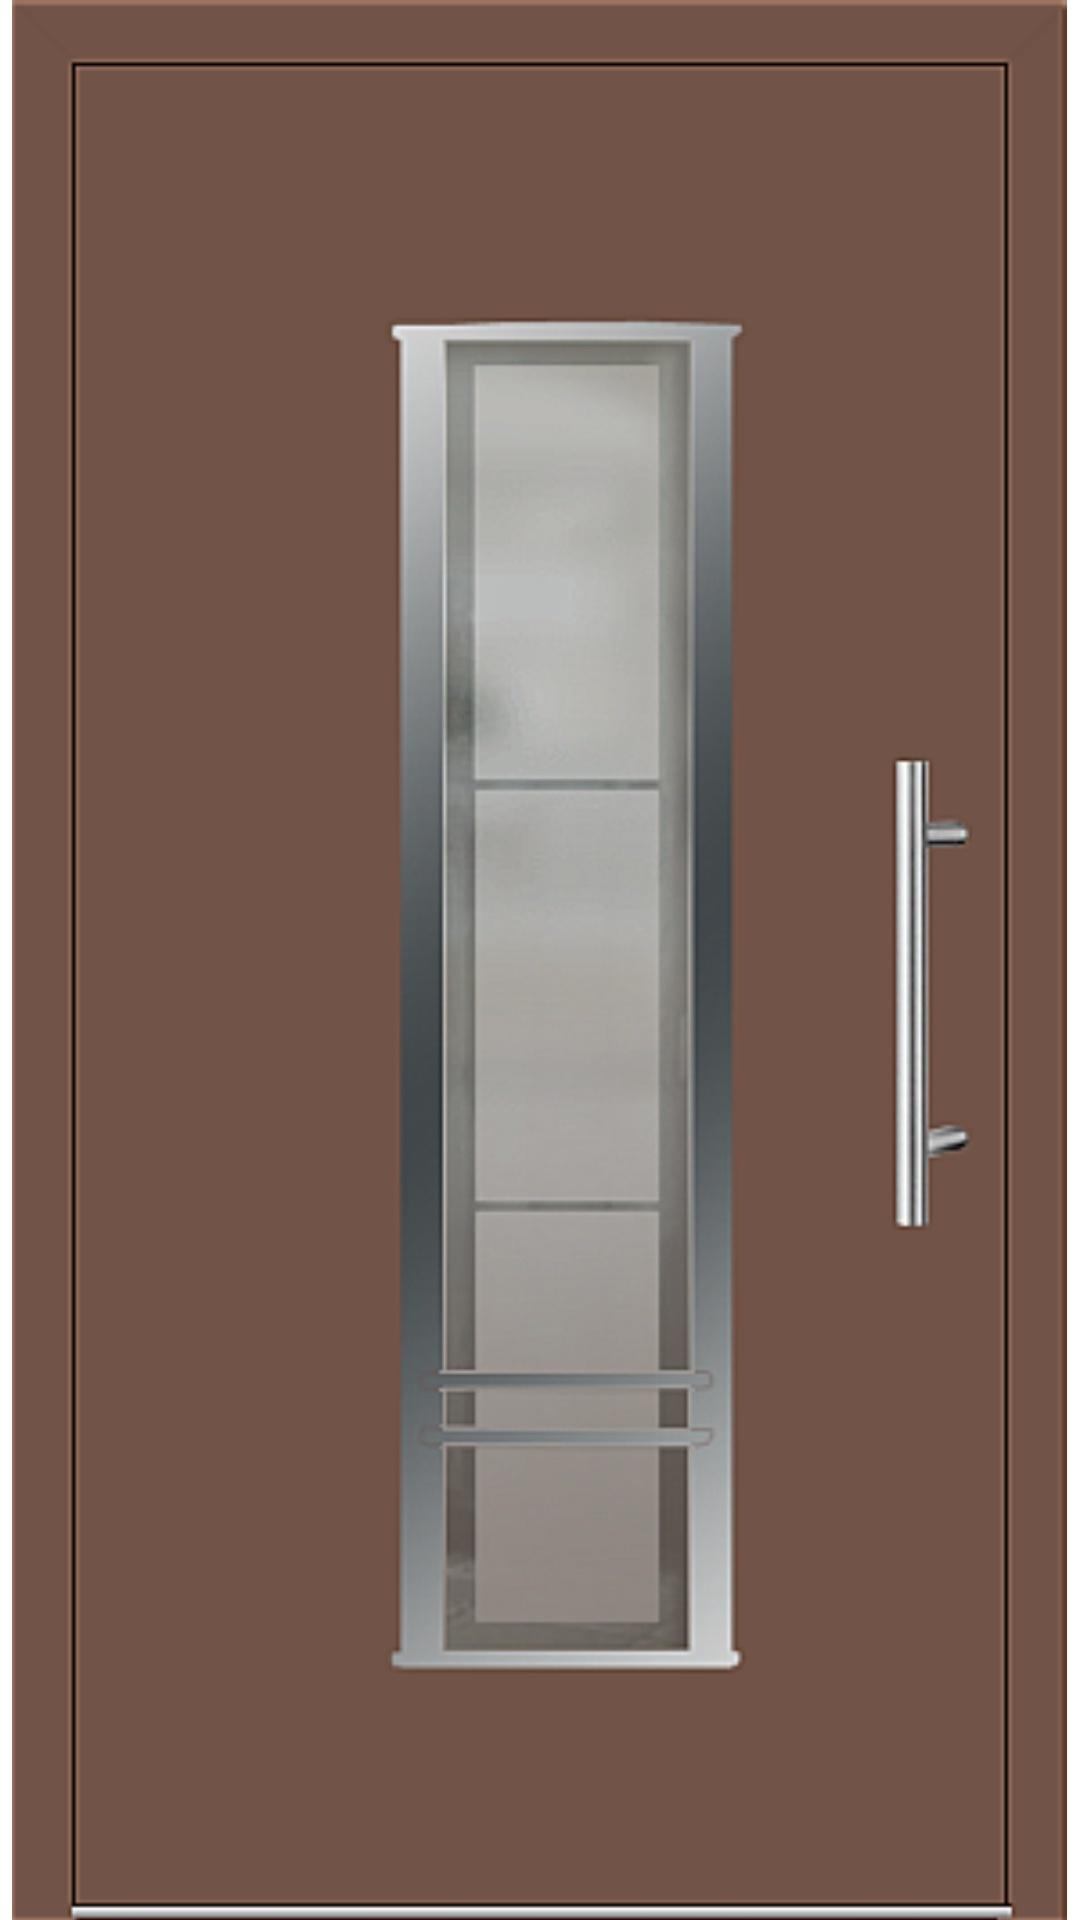 Kunststoff Haustür Modell 6817-79 lehmbraun